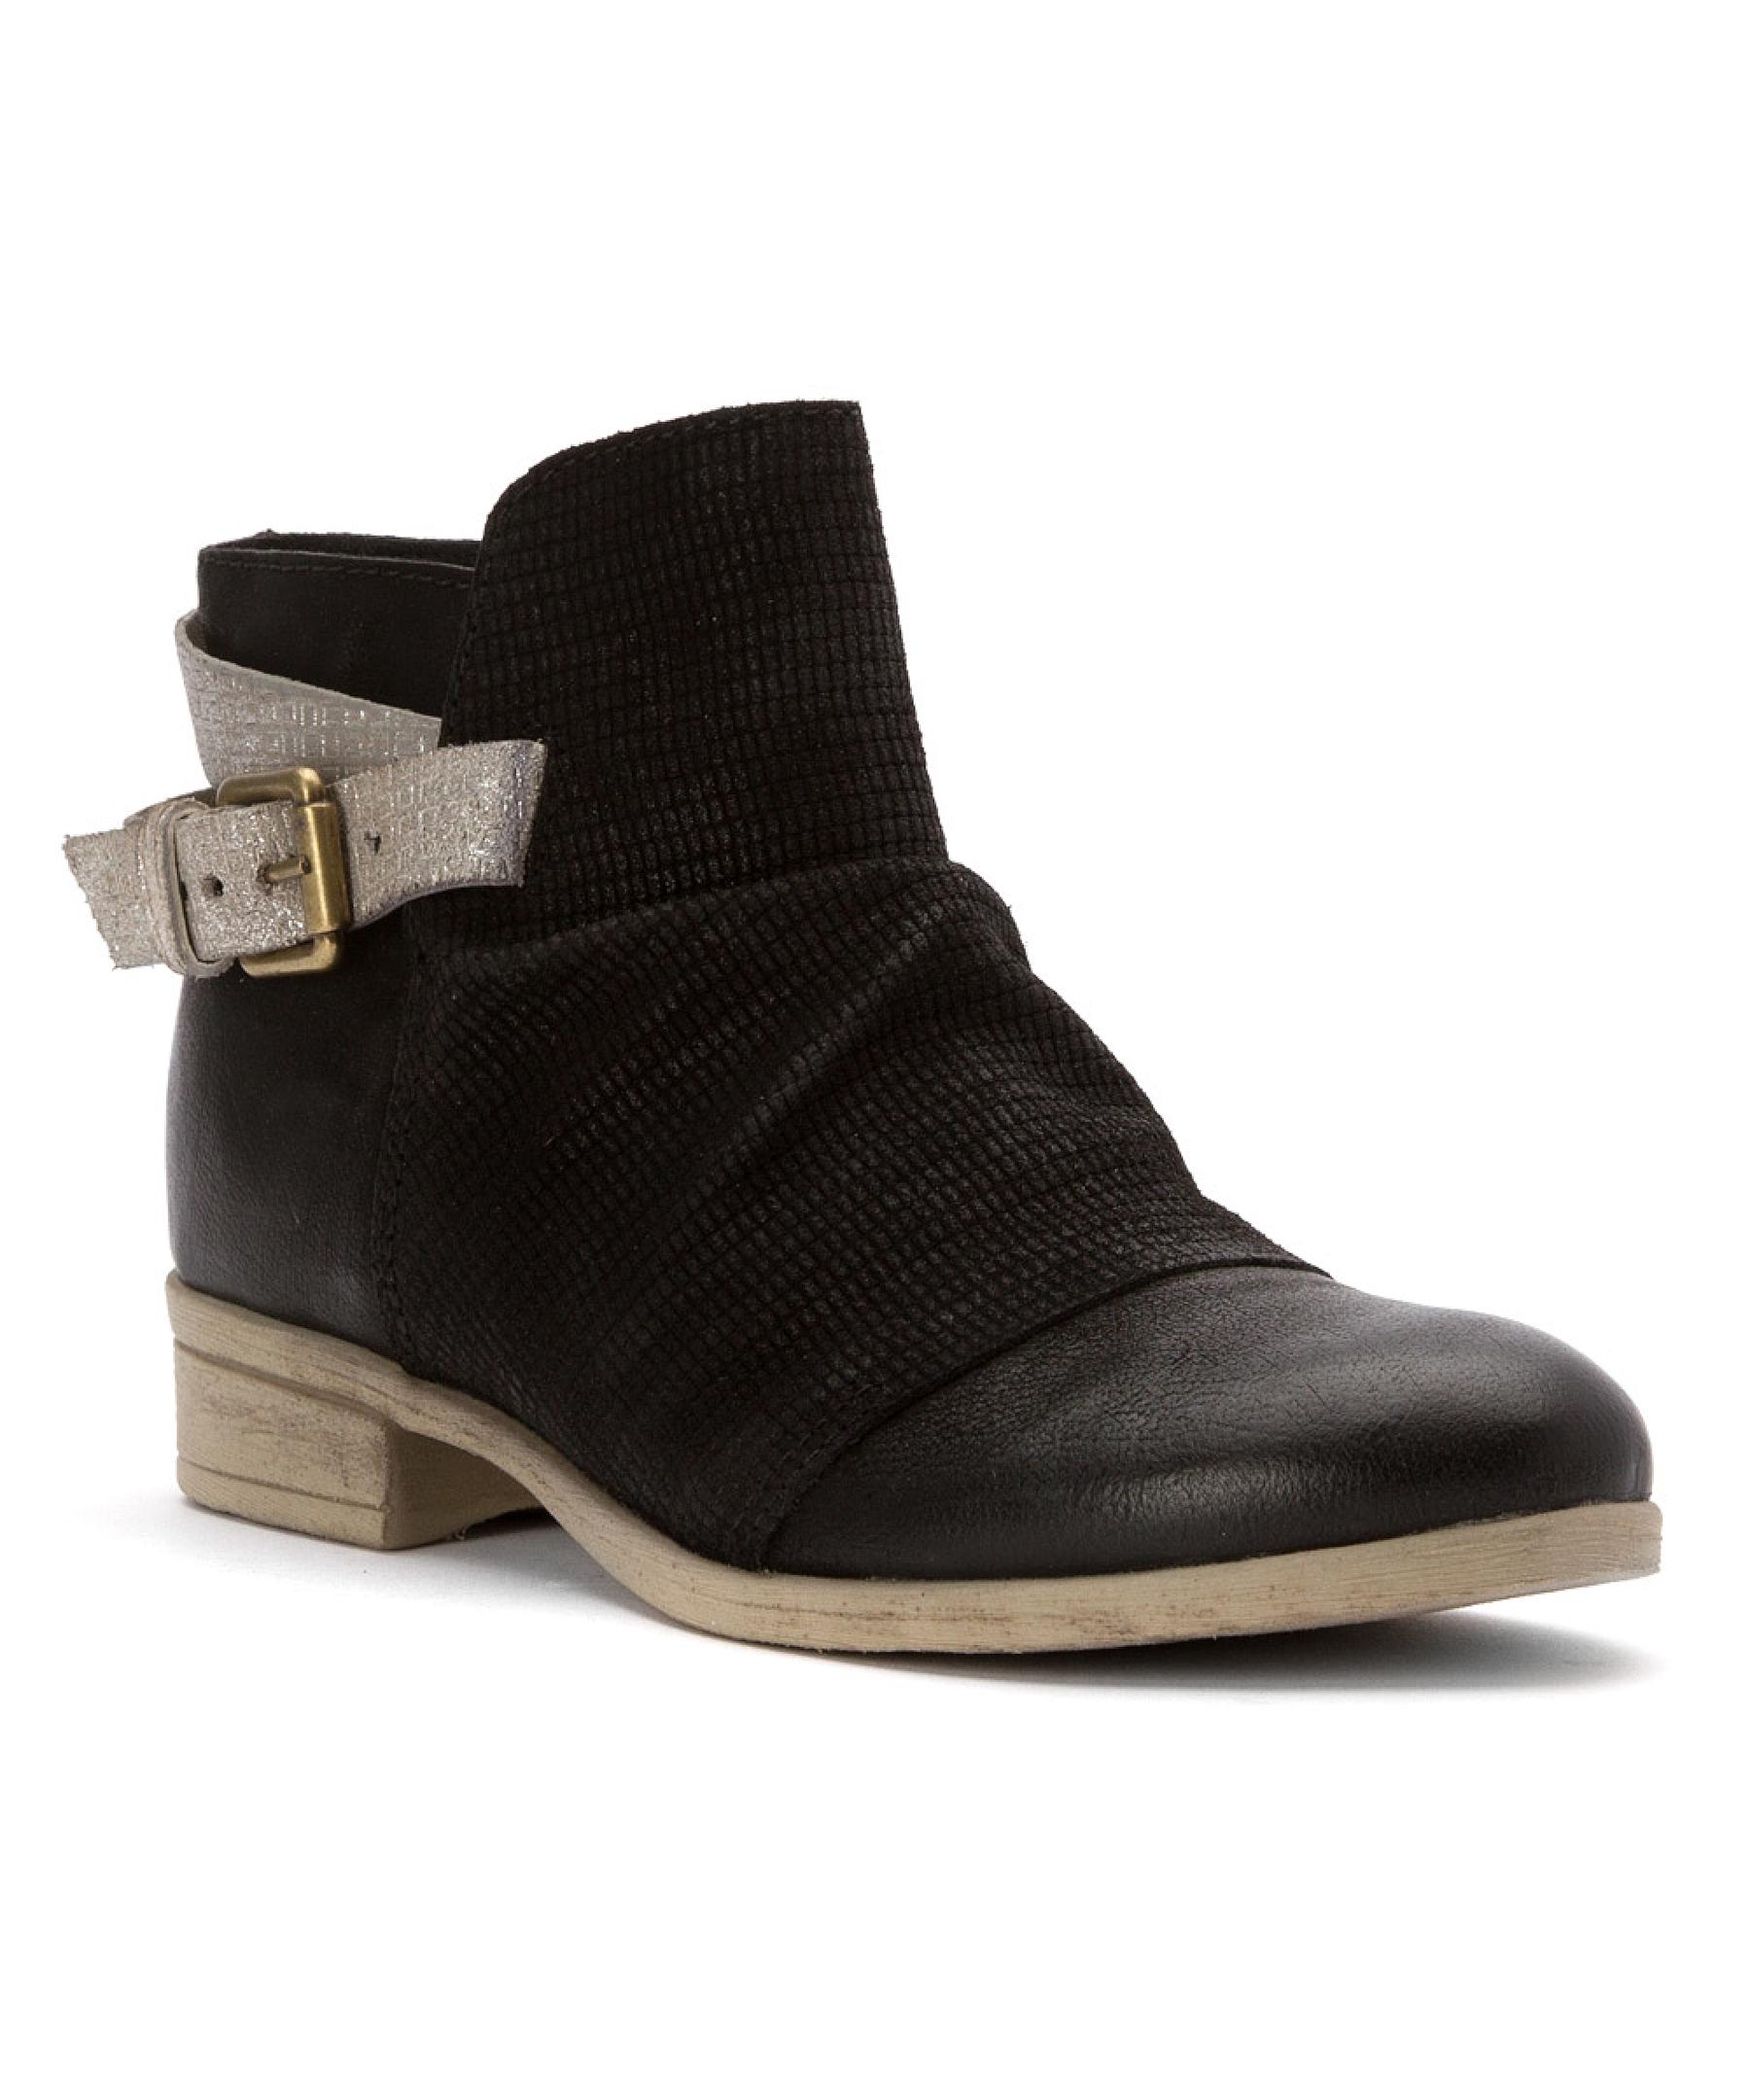 Miz Mooz Women S Petrie Boots In Black